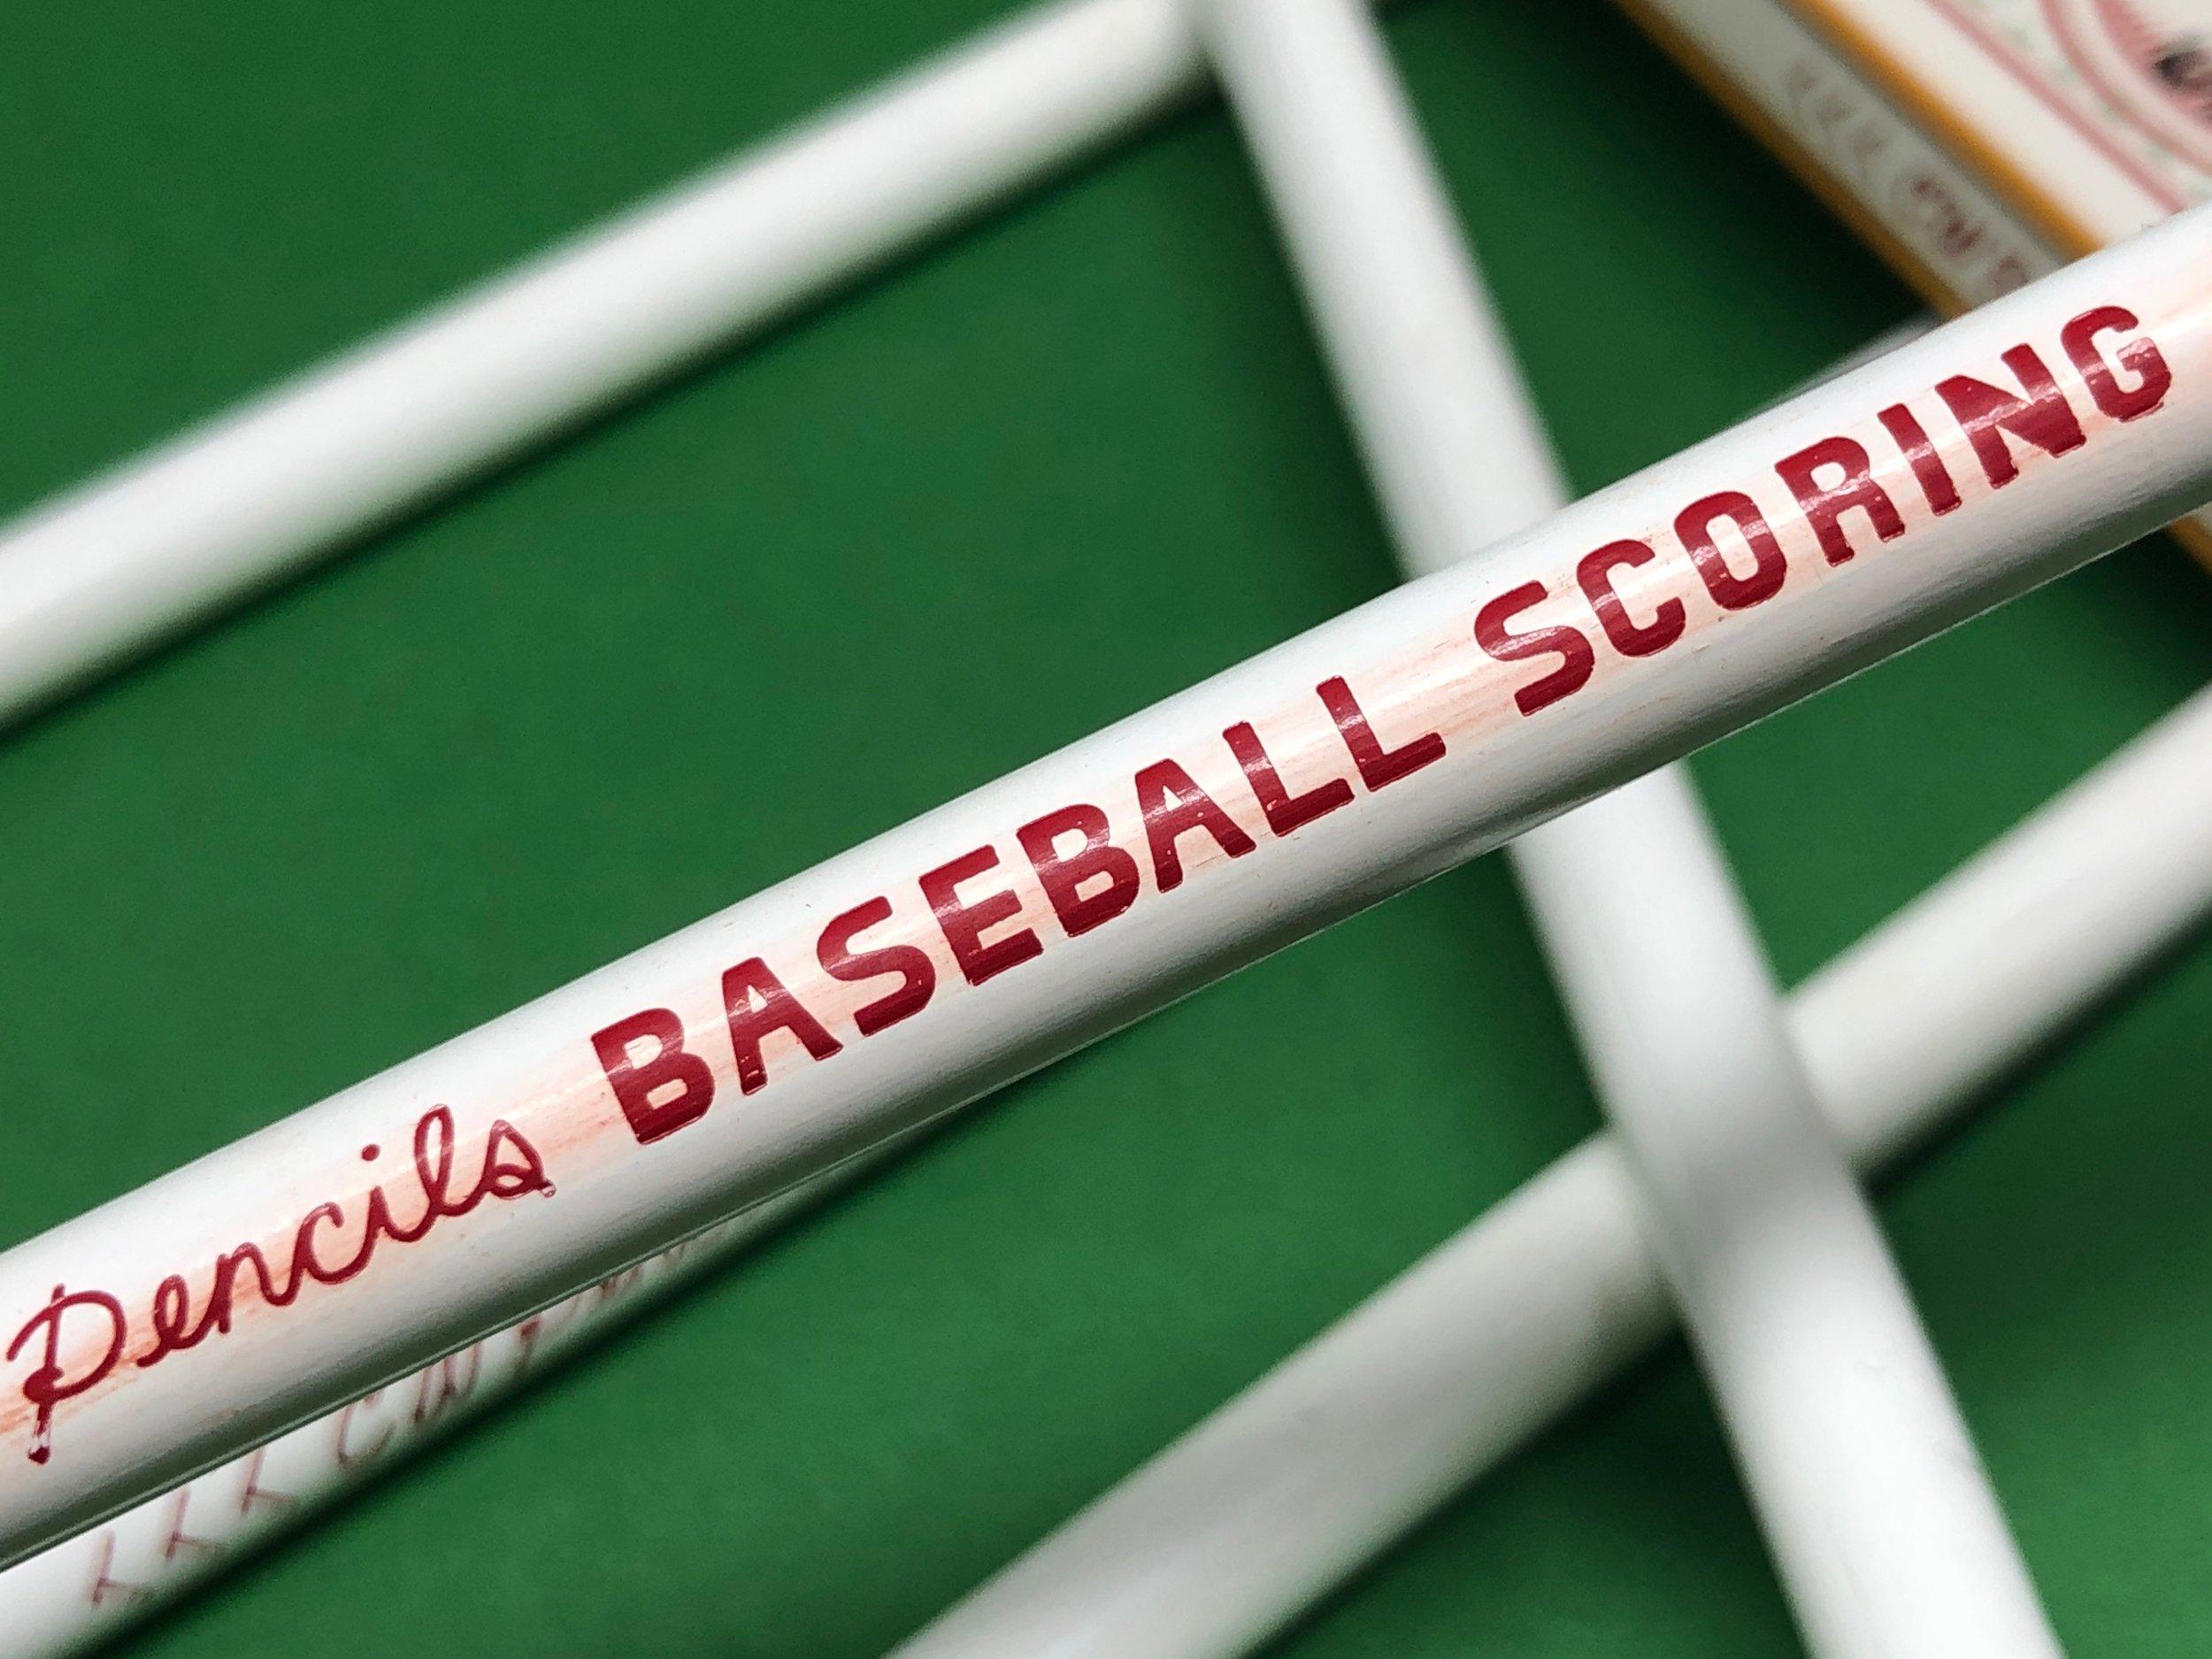 cwpe-generals-baseball-scoring-pencil-12.jpg